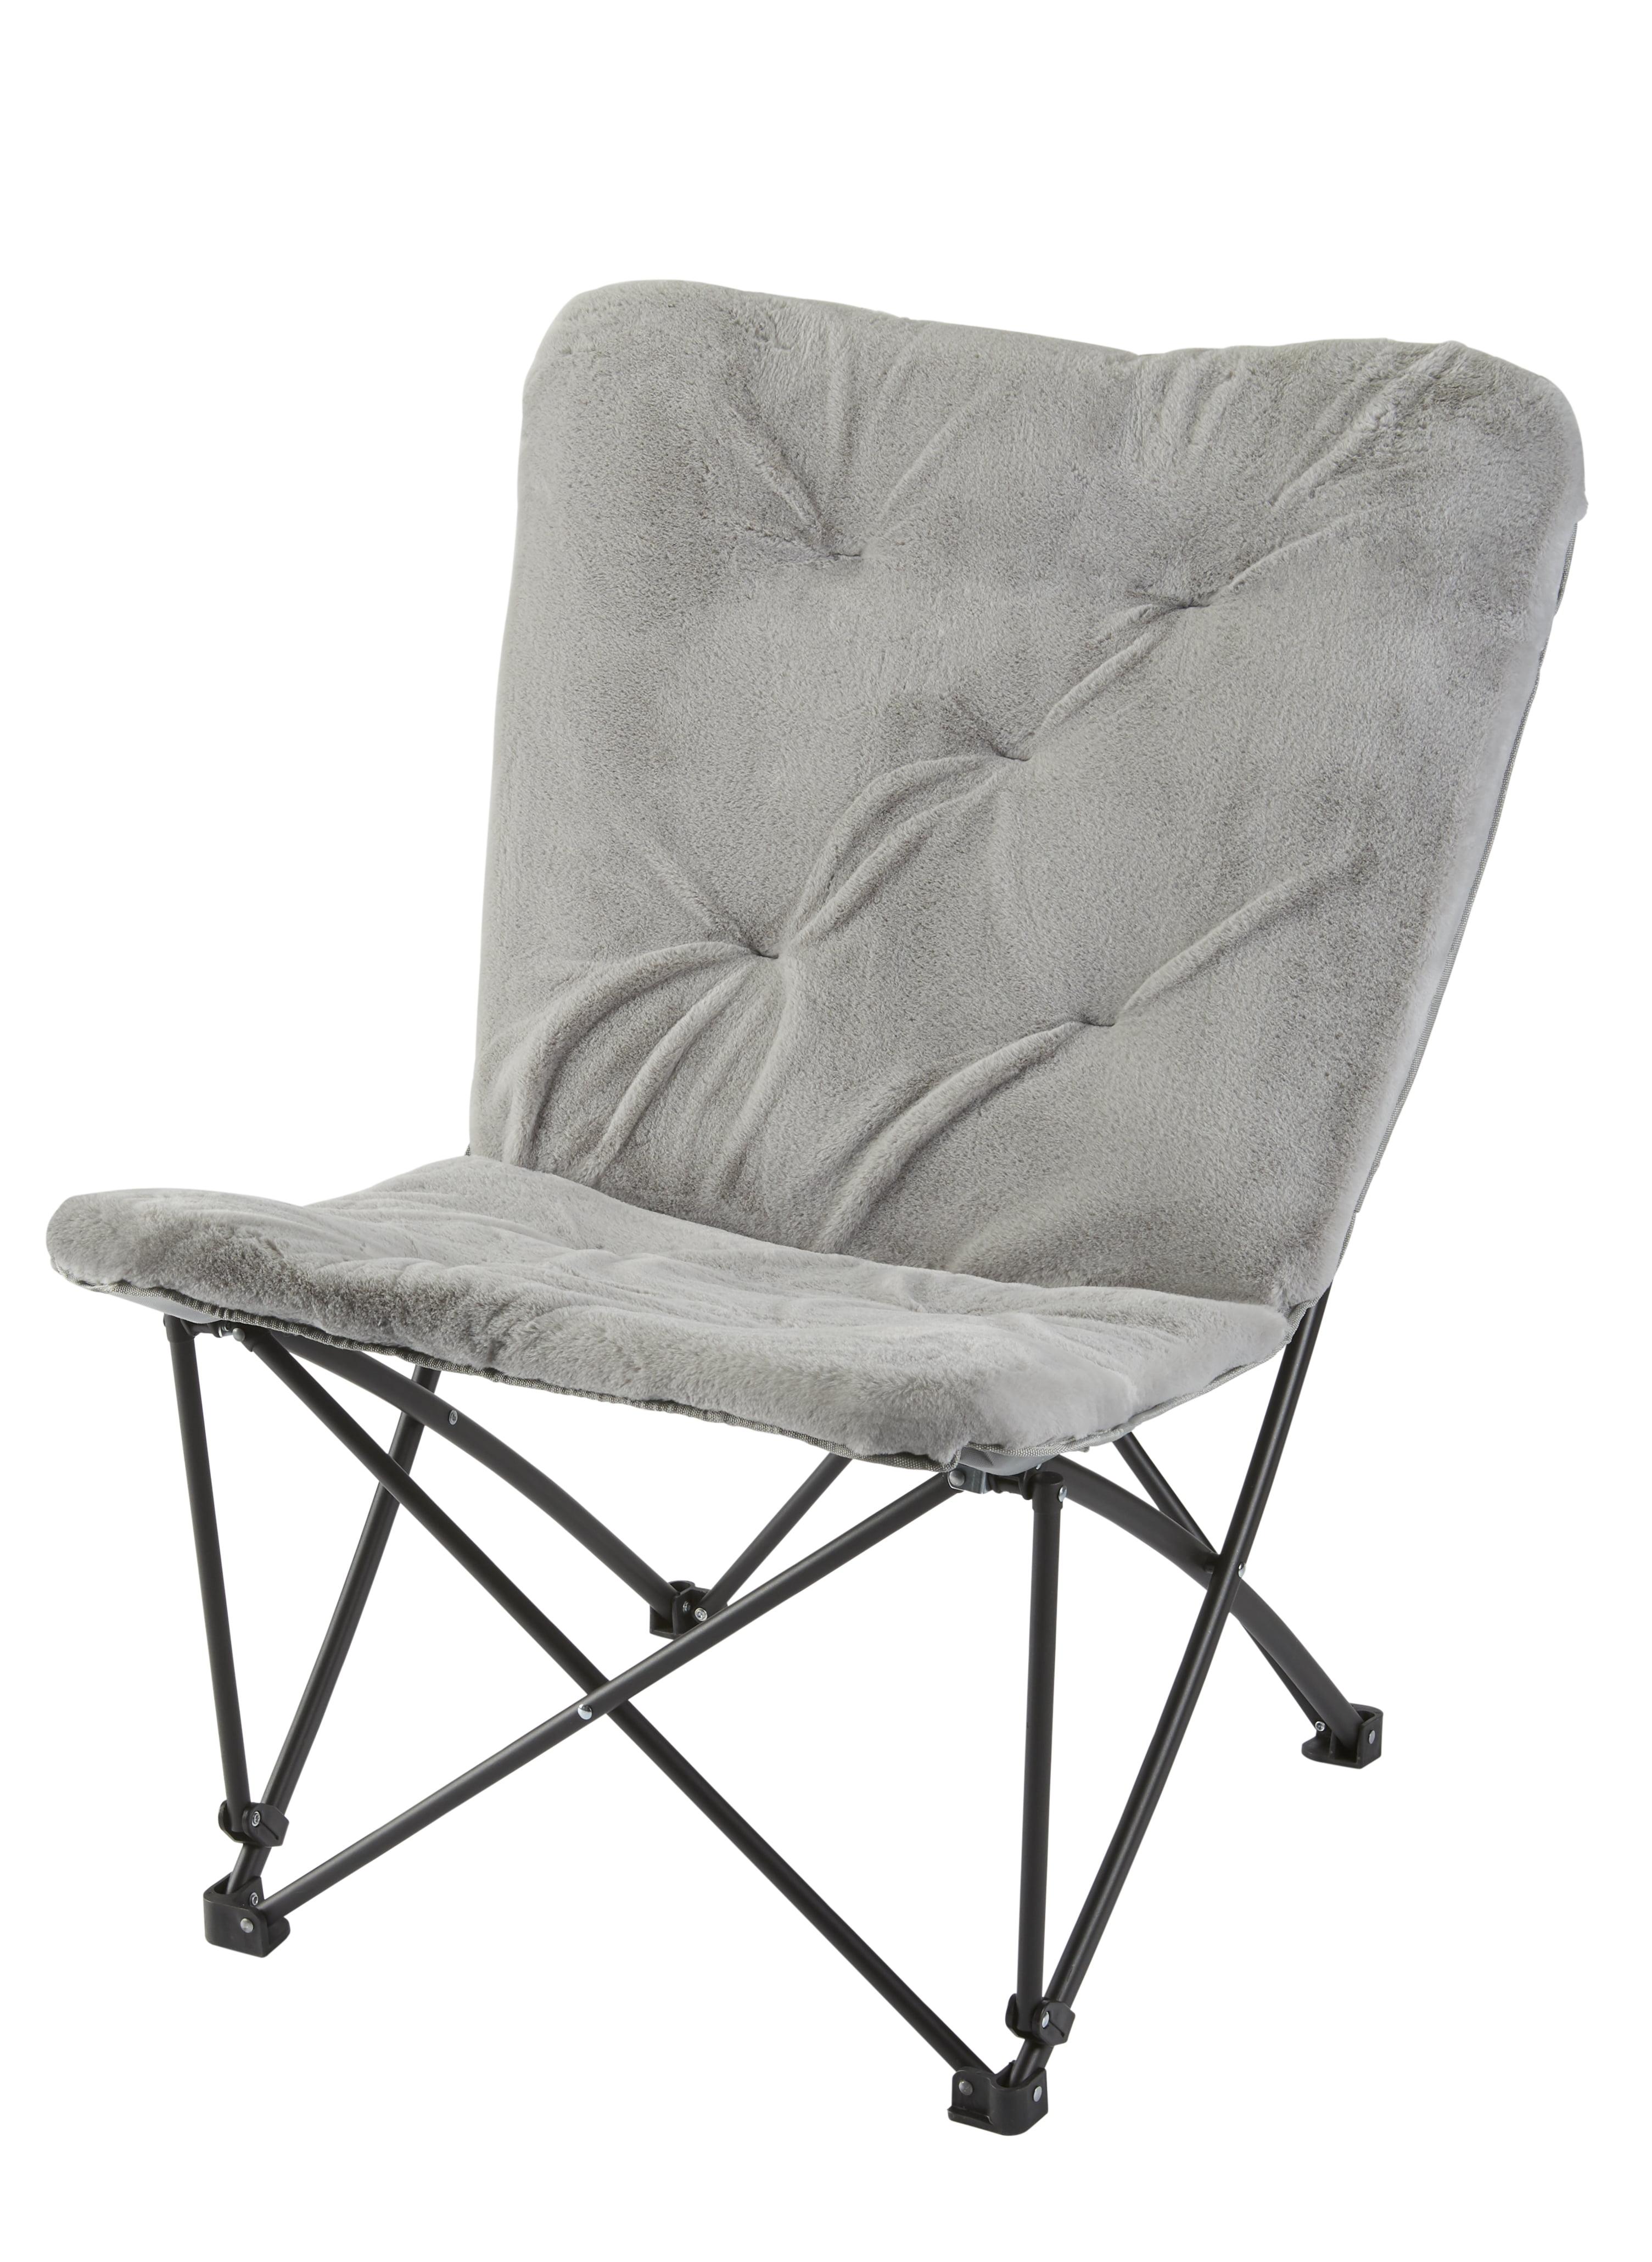 Cool Mainstays Memory Foam Folding Butterfly Lounge Chair Multiple Colors Walmart Com Creativecarmelina Interior Chair Design Creativecarmelinacom